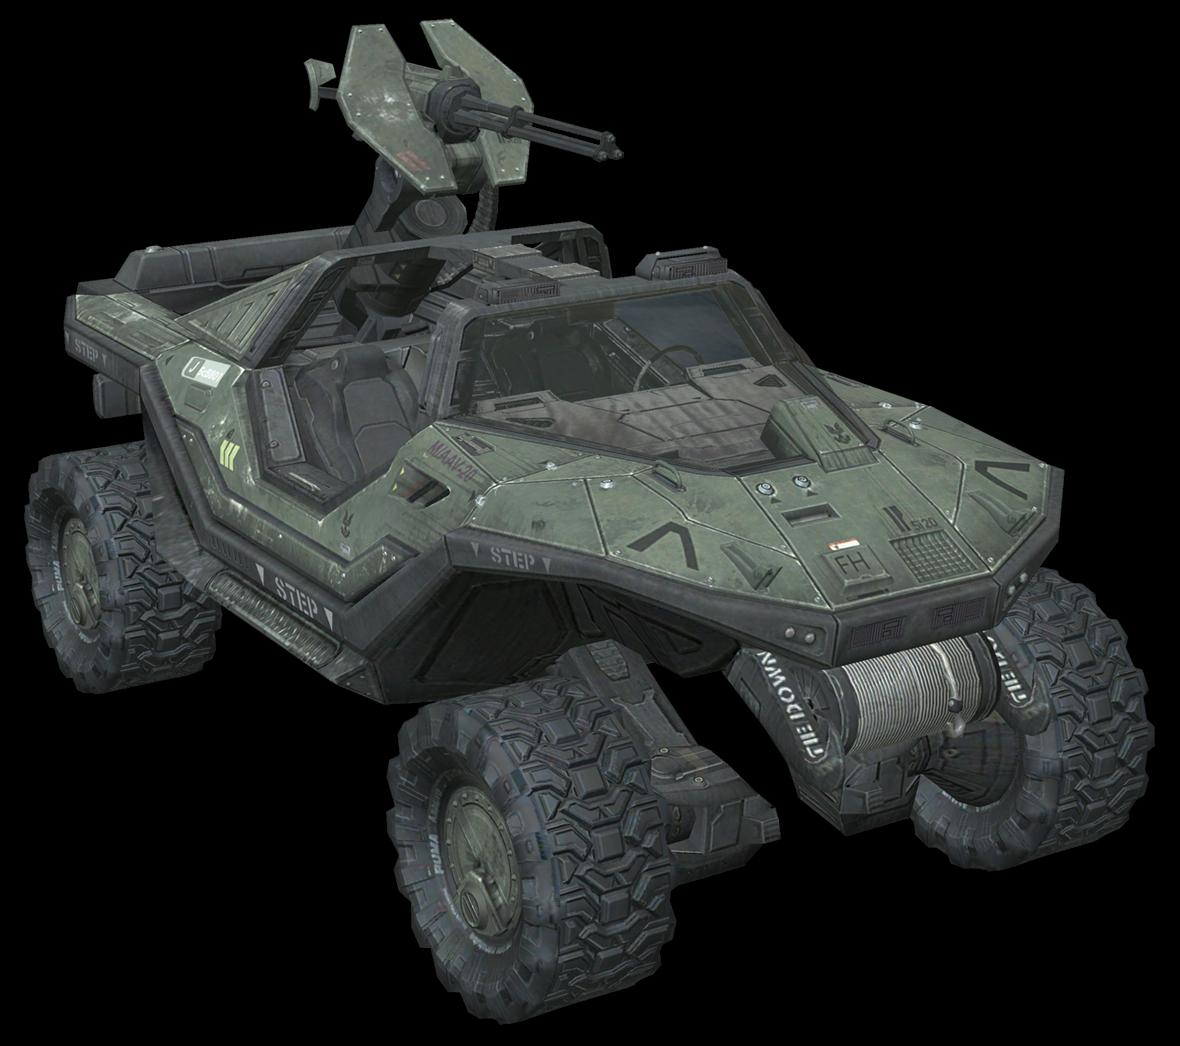 20110815040148!Halo_Reach_Warthog.png